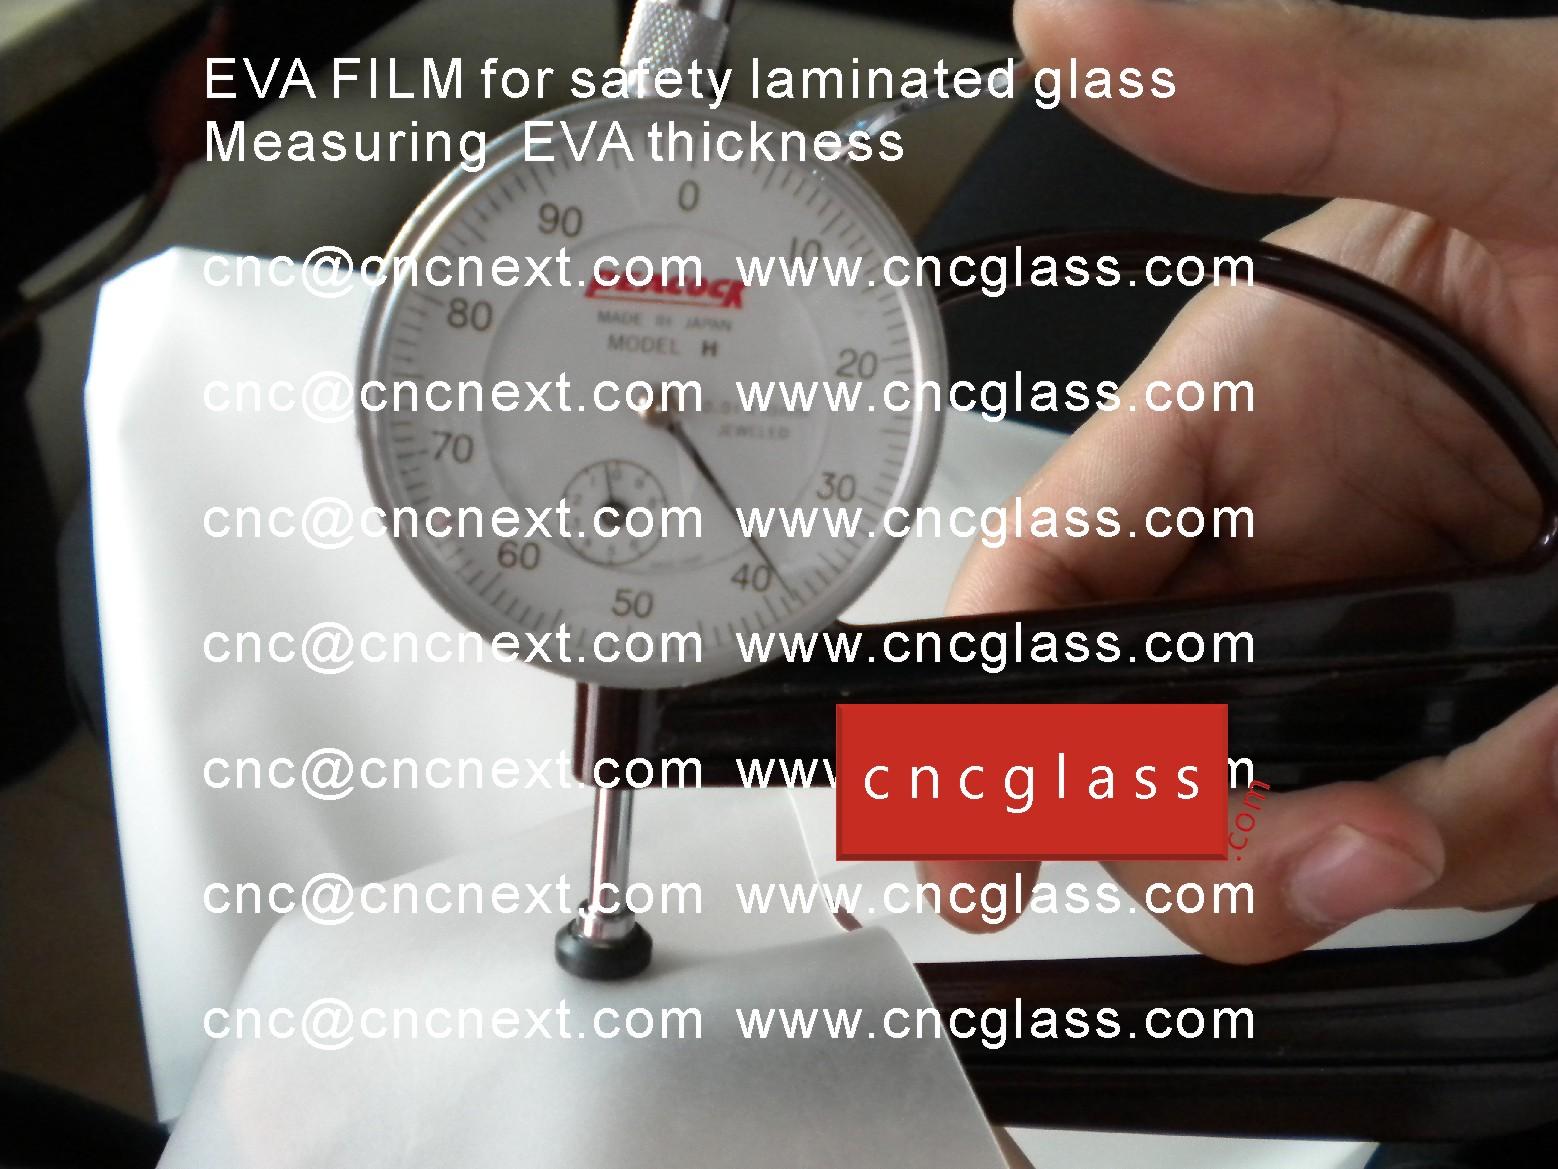 009 EVAFORCE EVA FILM FOR SAFETY LAMINATED GLASS